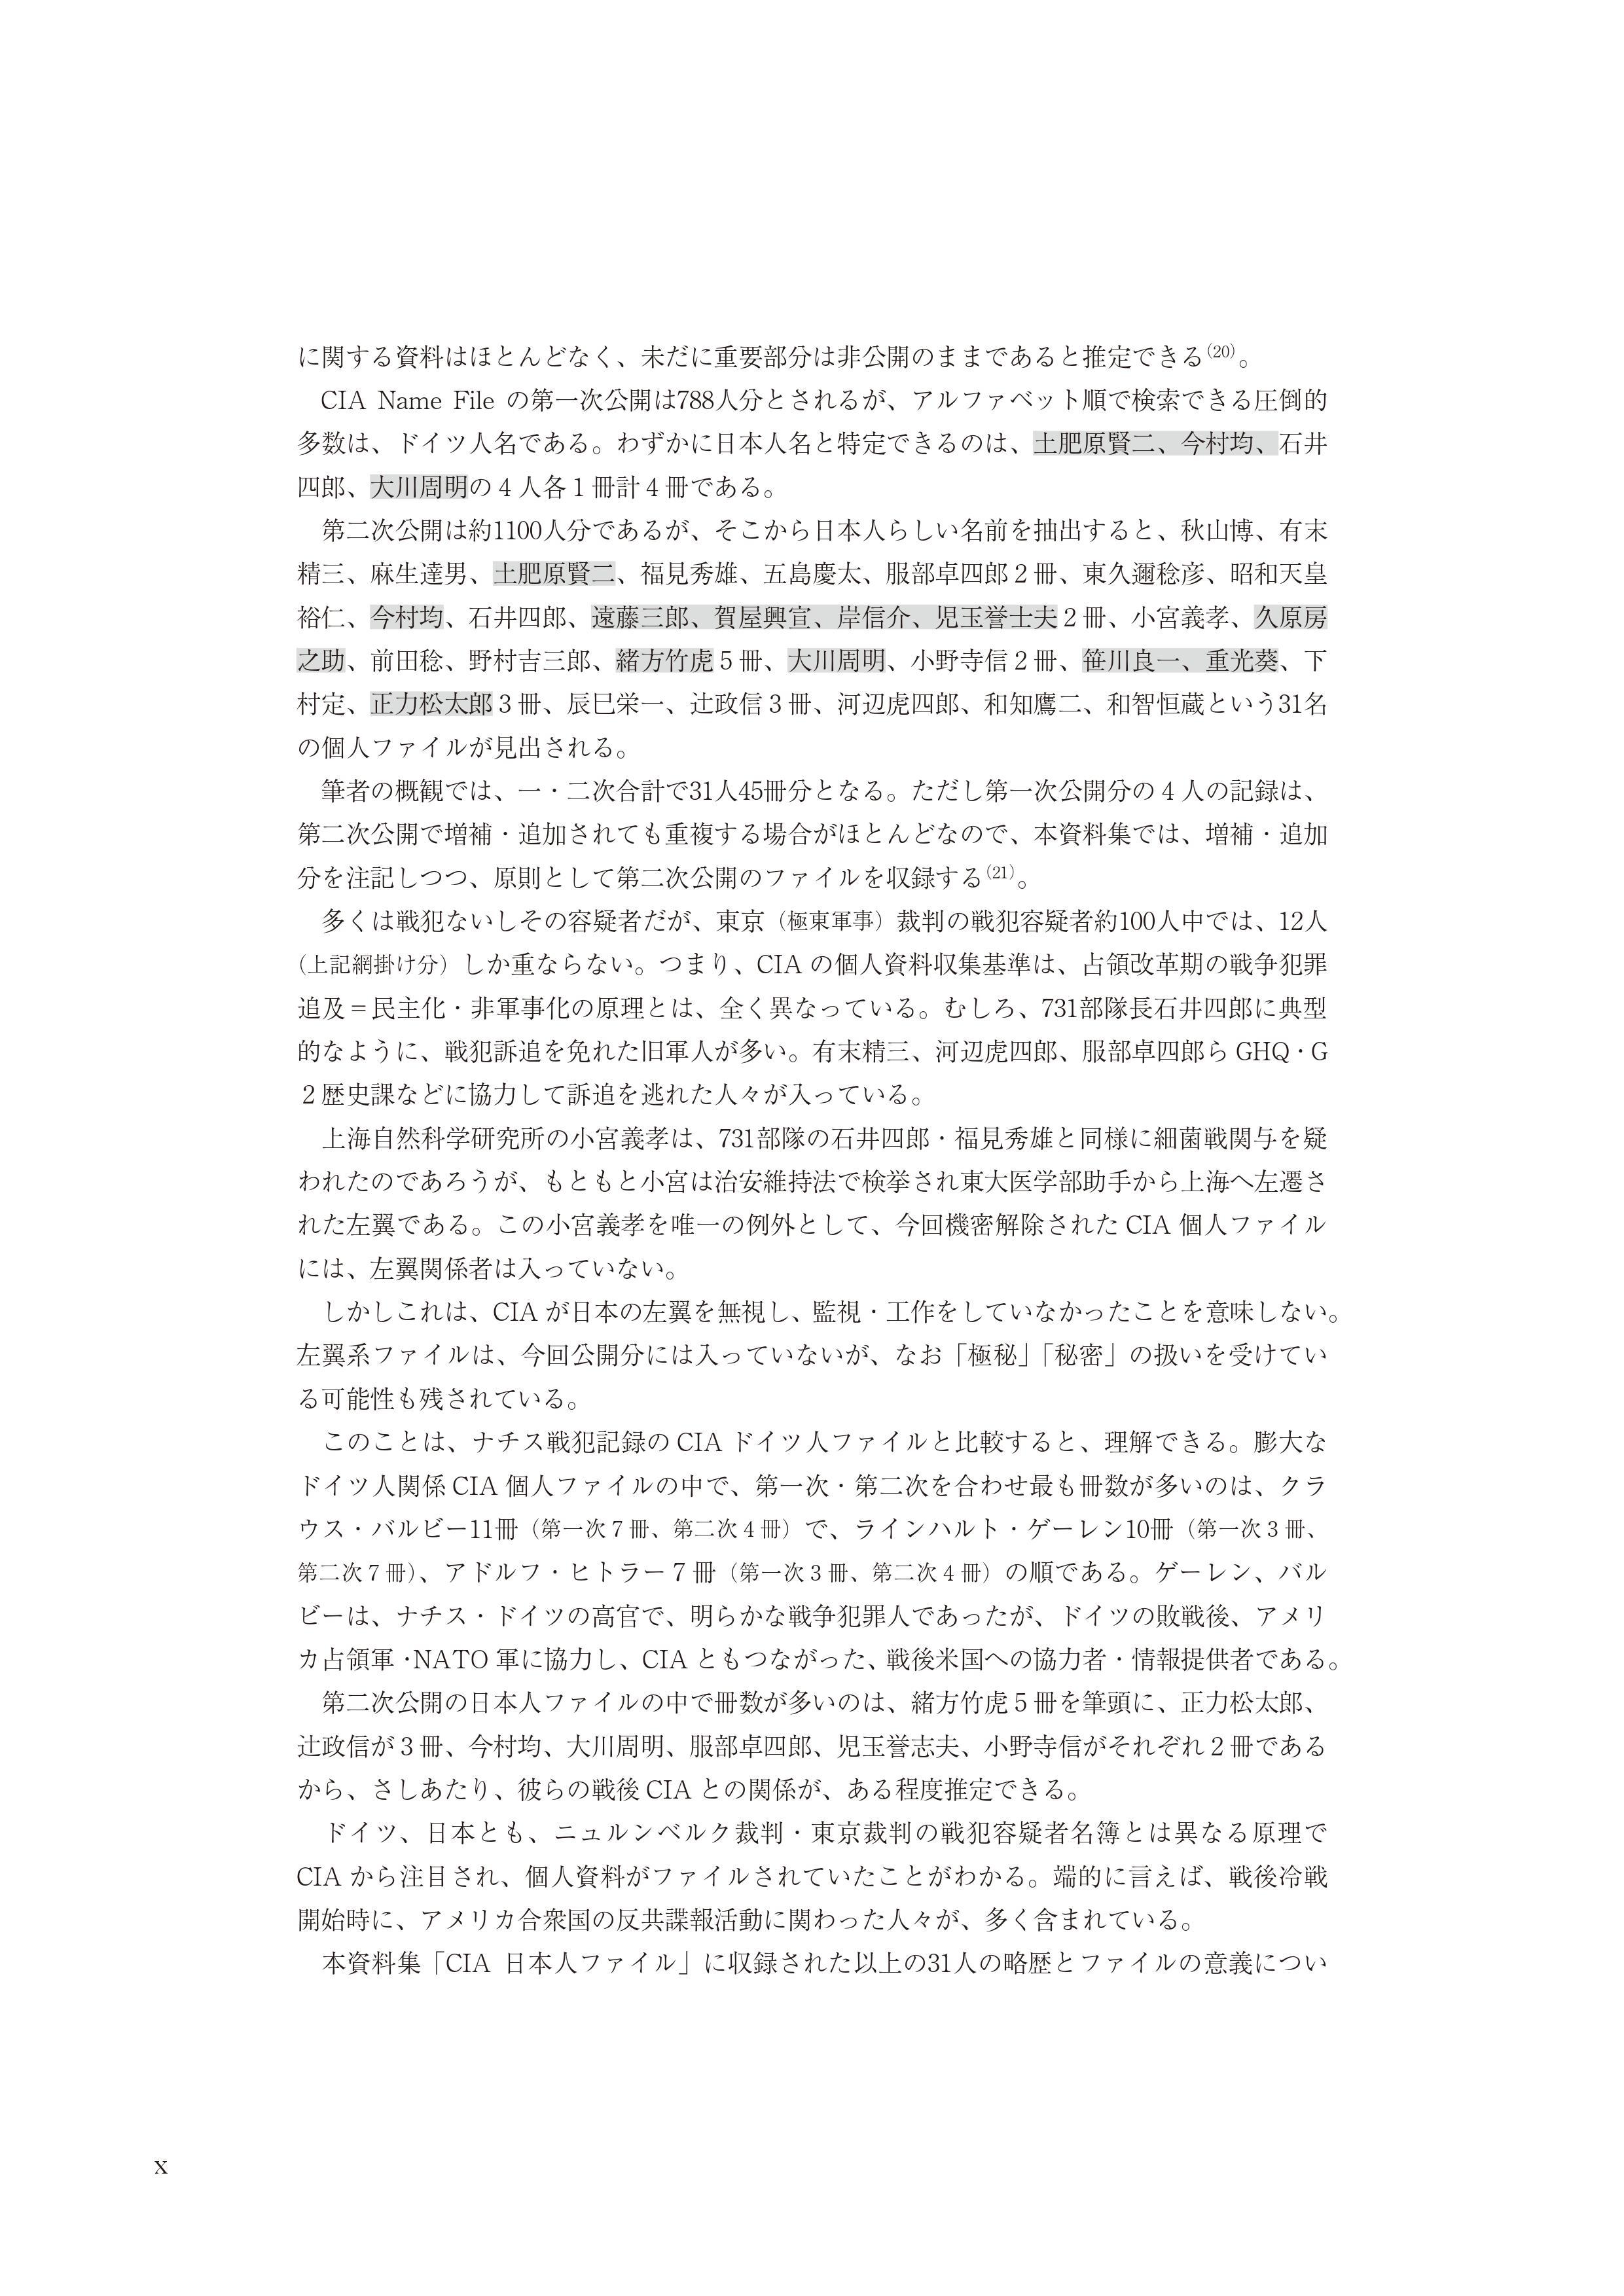 CIA日本人ファイル0001 (10)